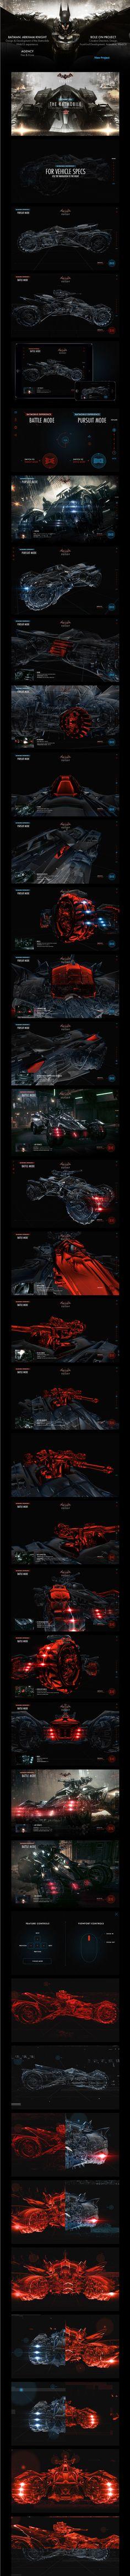 Batman: Arkham Knight Batmobile Experience